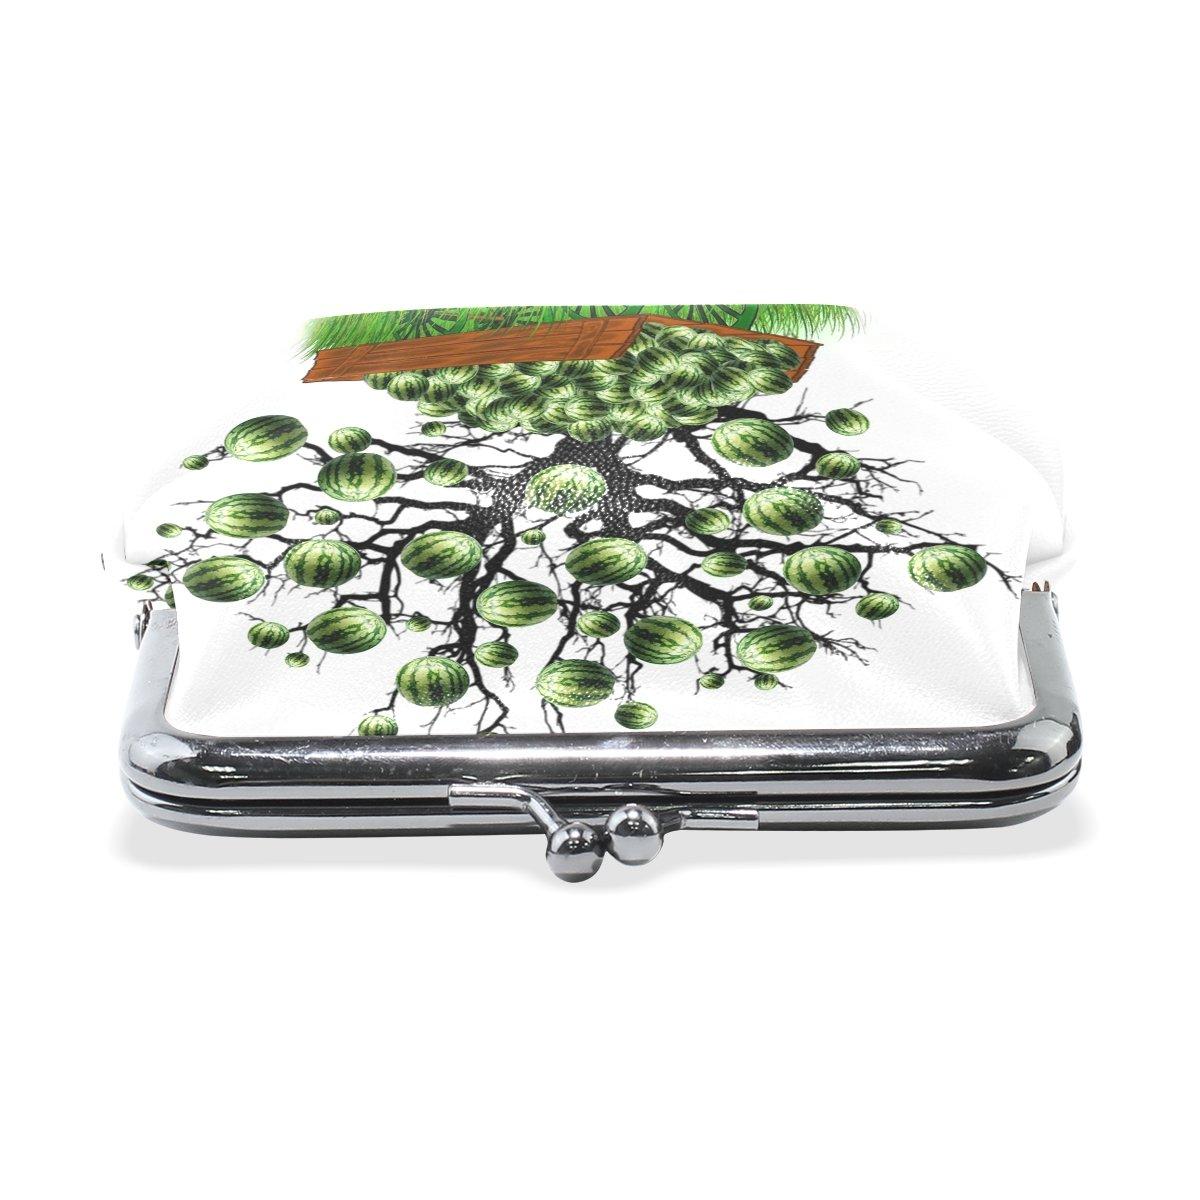 Coin Purse Watermelon Tree Wallet Buckle Clutch Handbag For Women Girls Gift